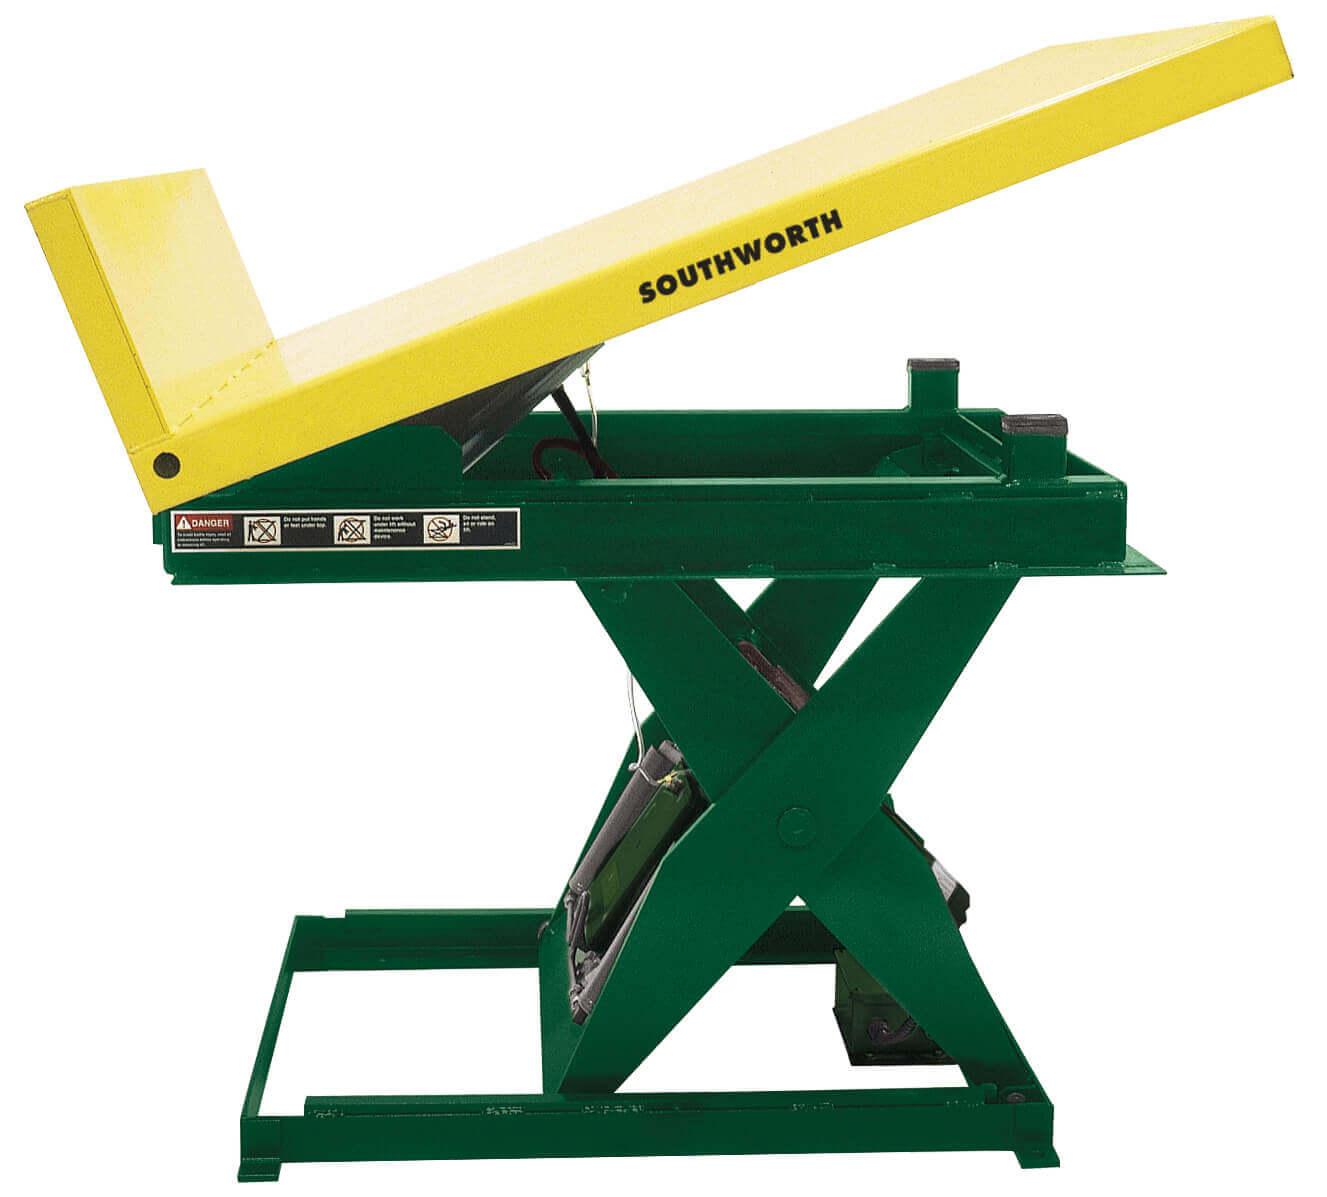 lift and tilt machine